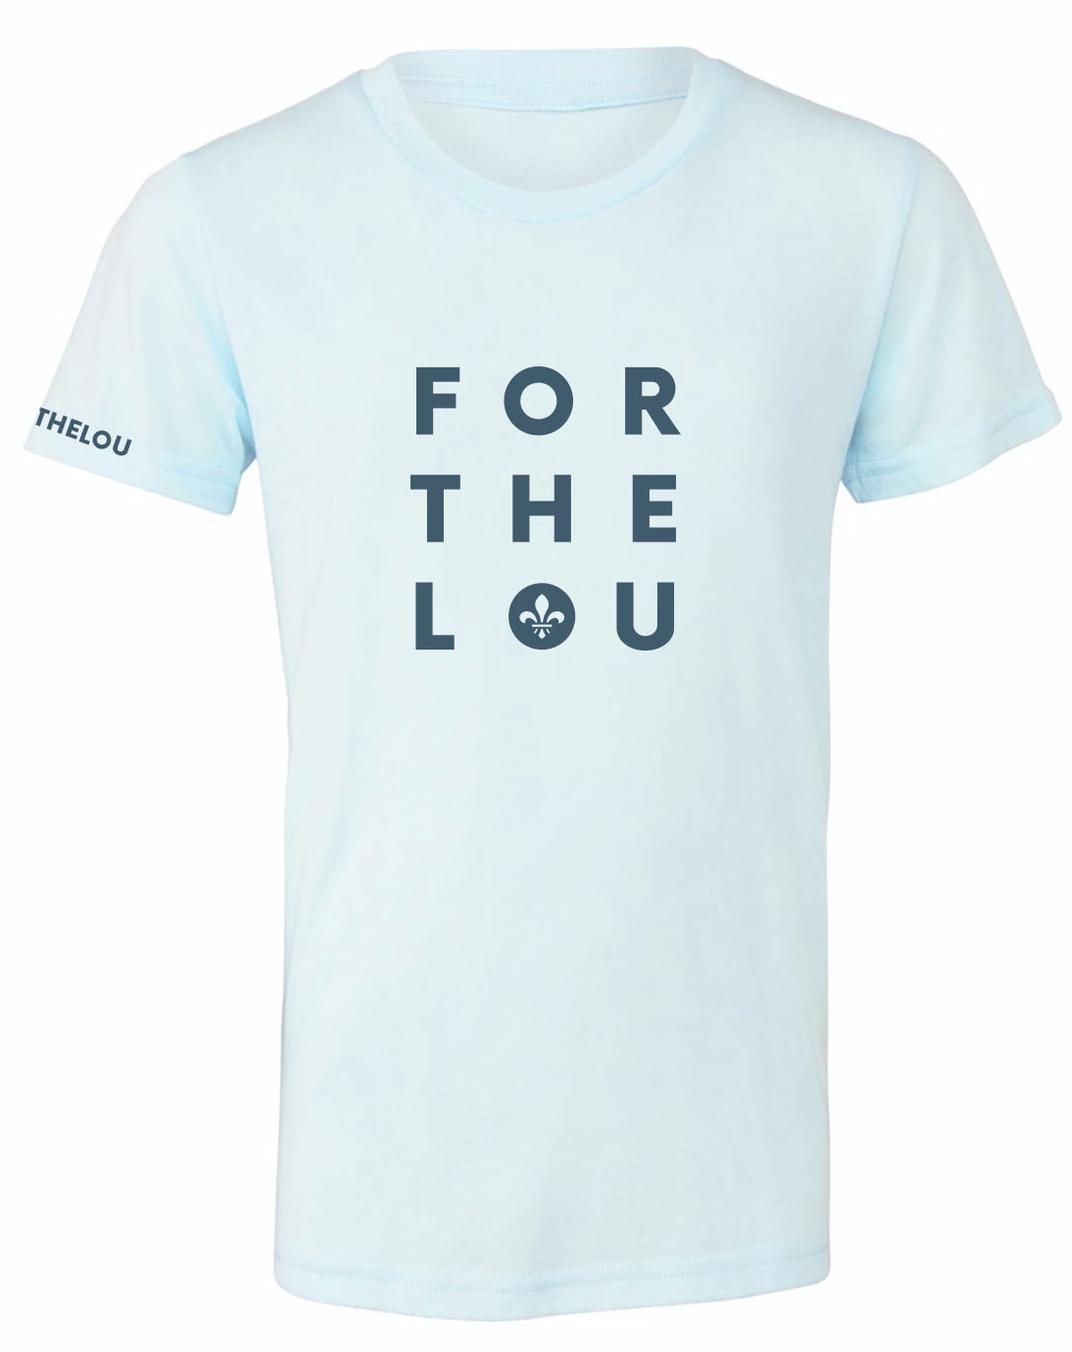 Forthelou - T-Shirt - YouthMedium